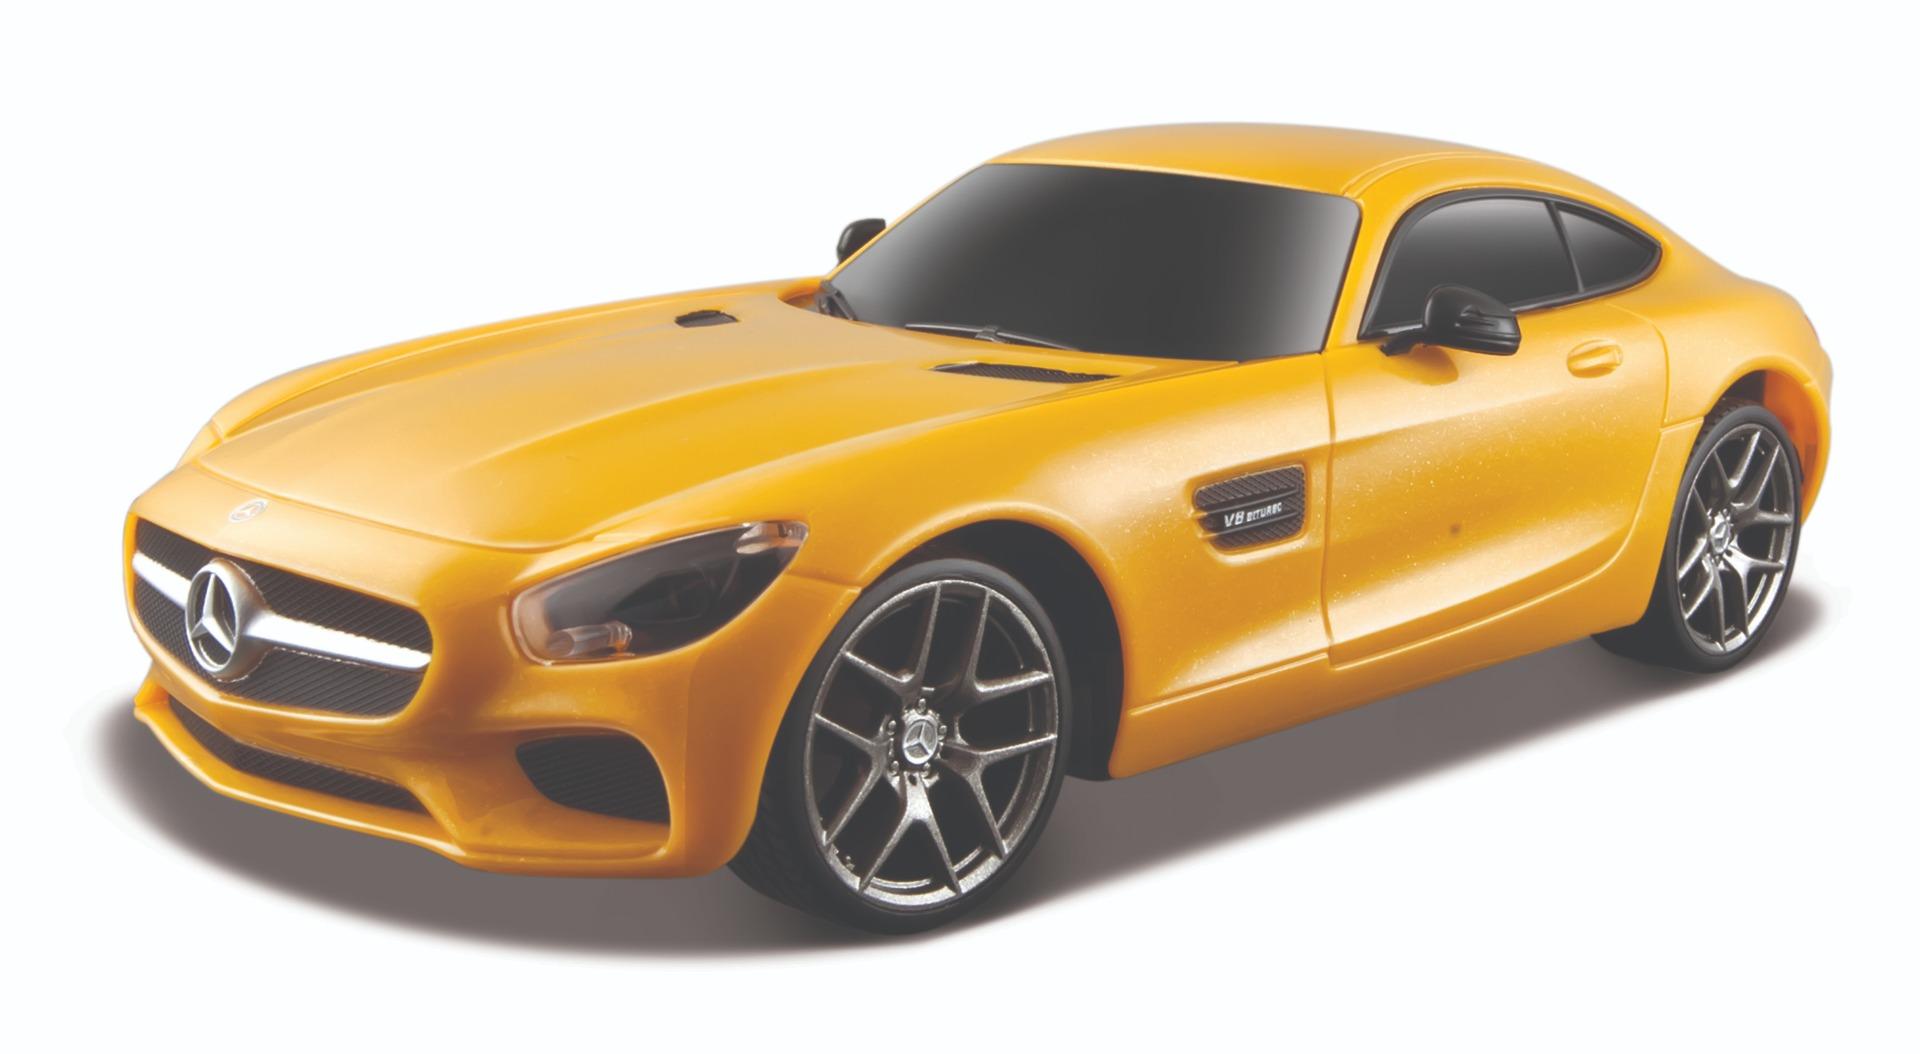 Masinuta Maisto Mercedes-Amg GT Rc, 1:24